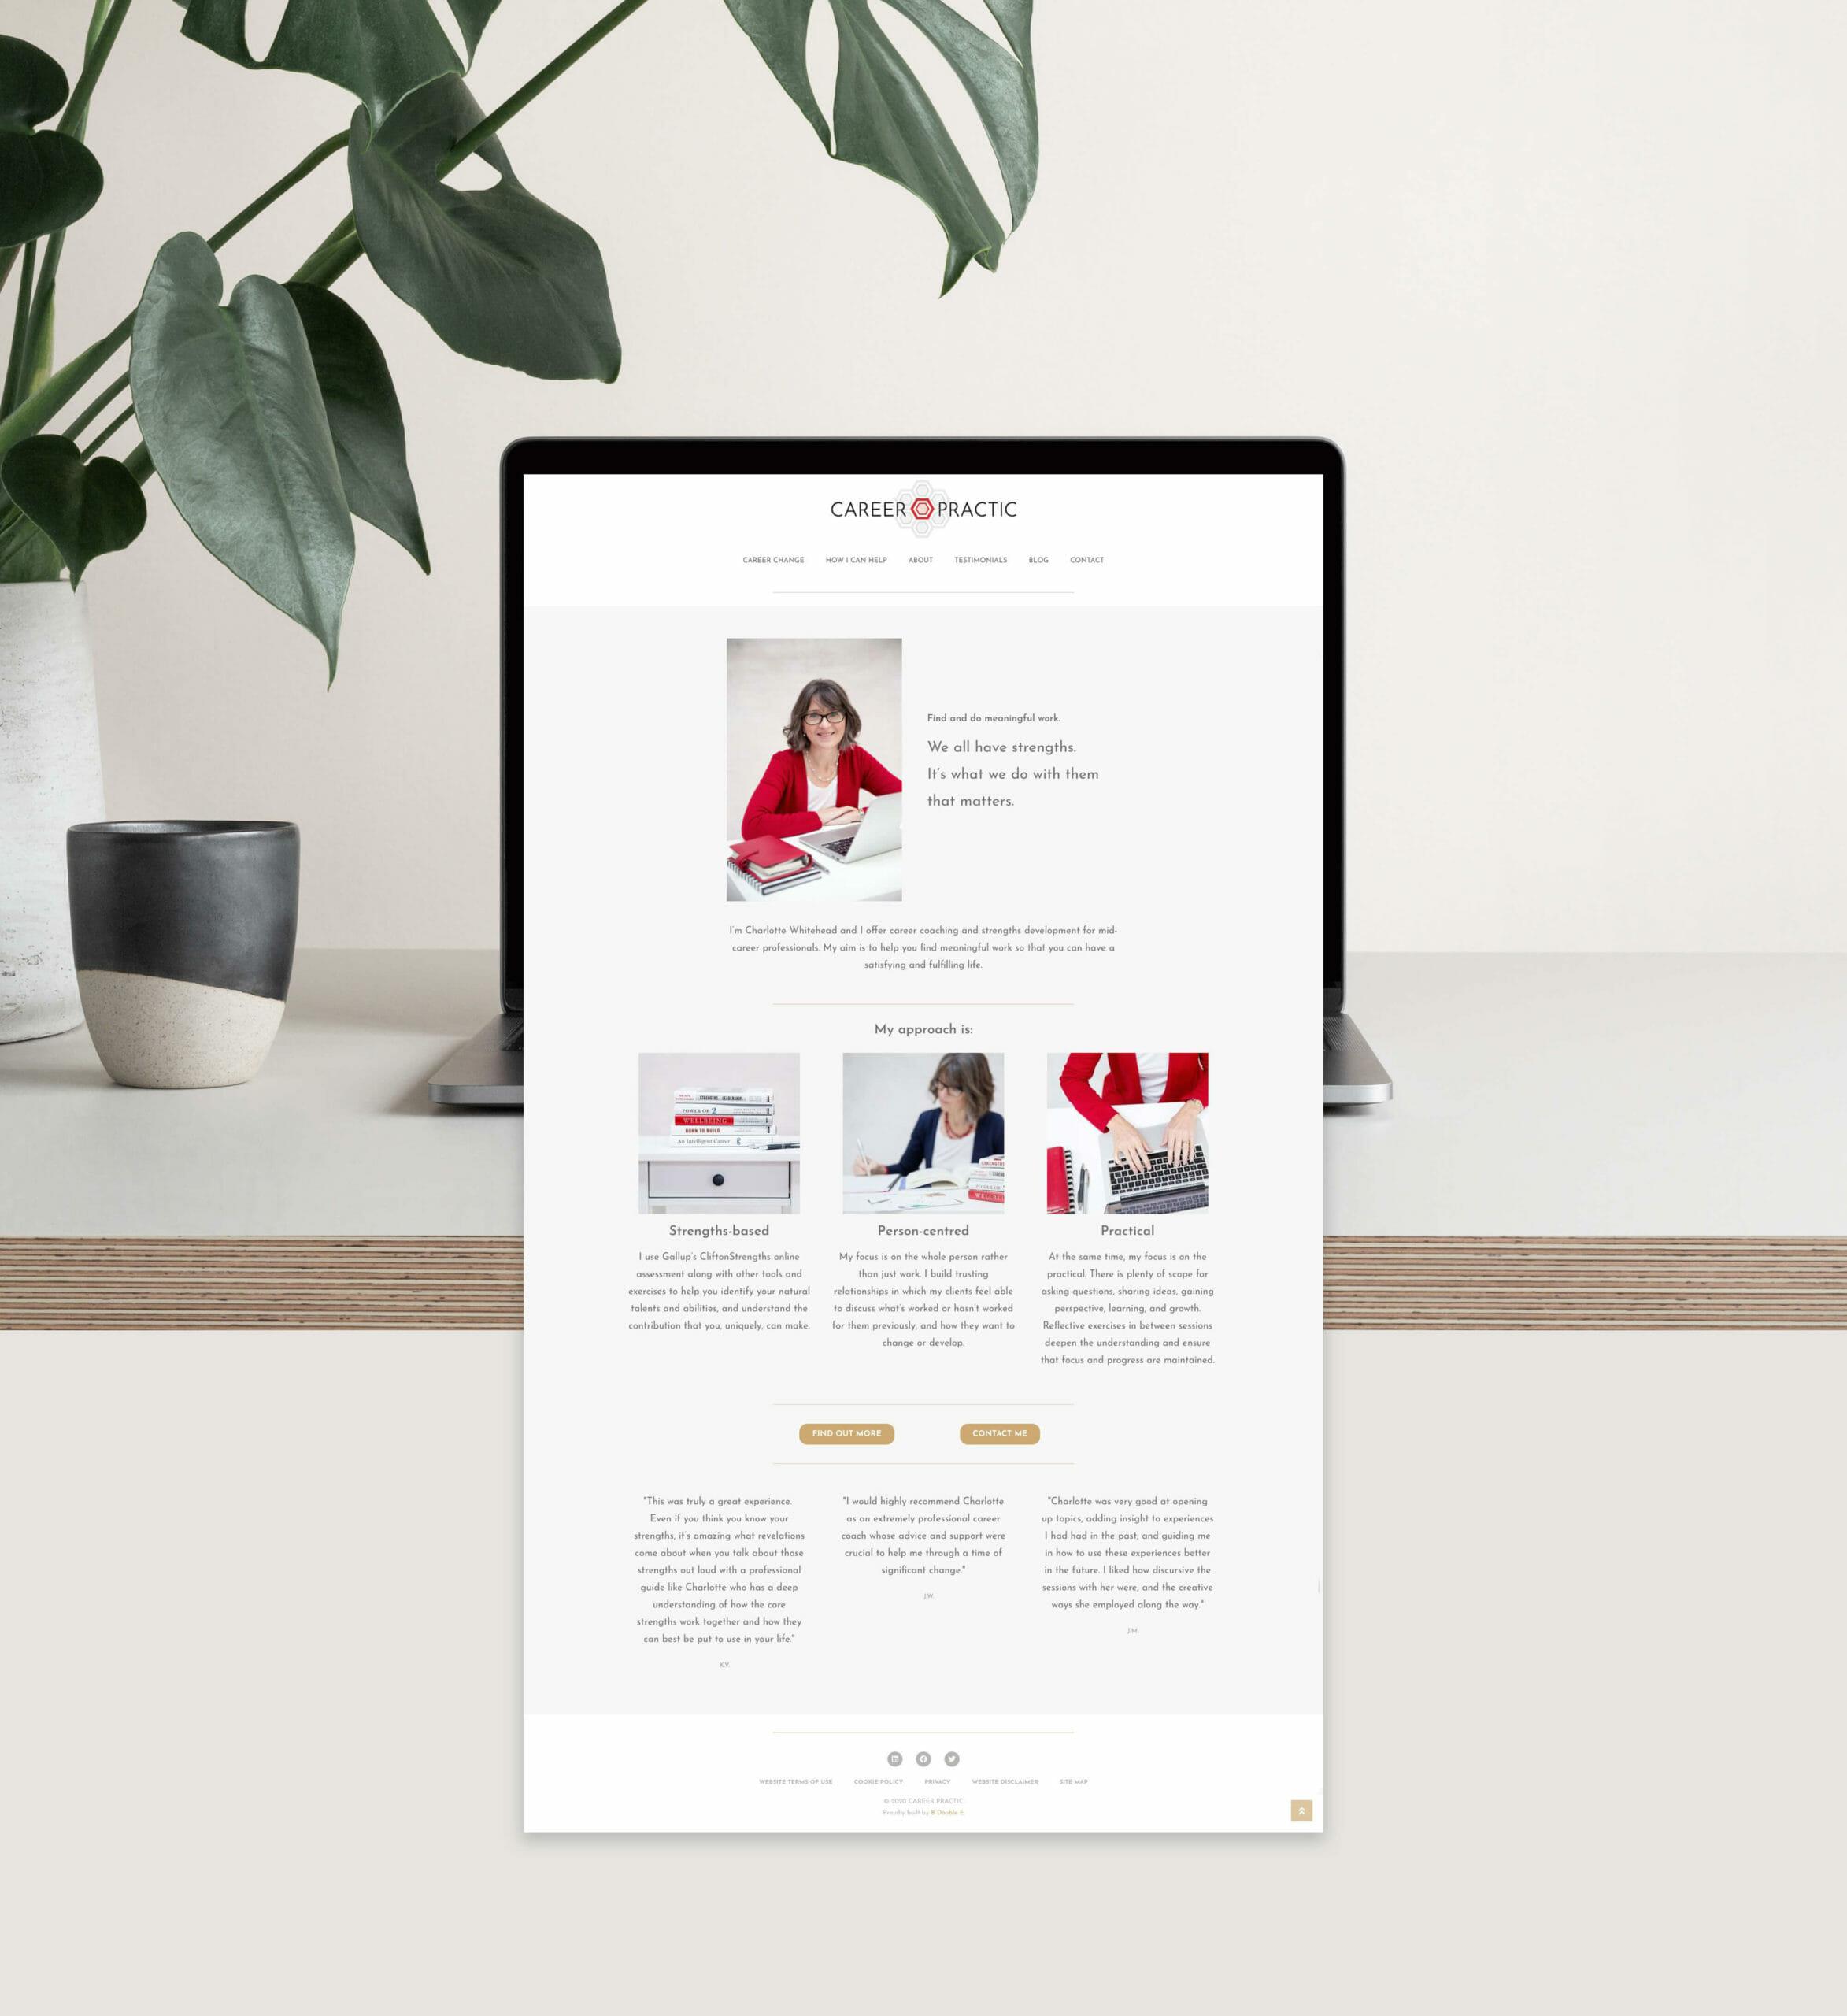 Career Practic responsive website home page